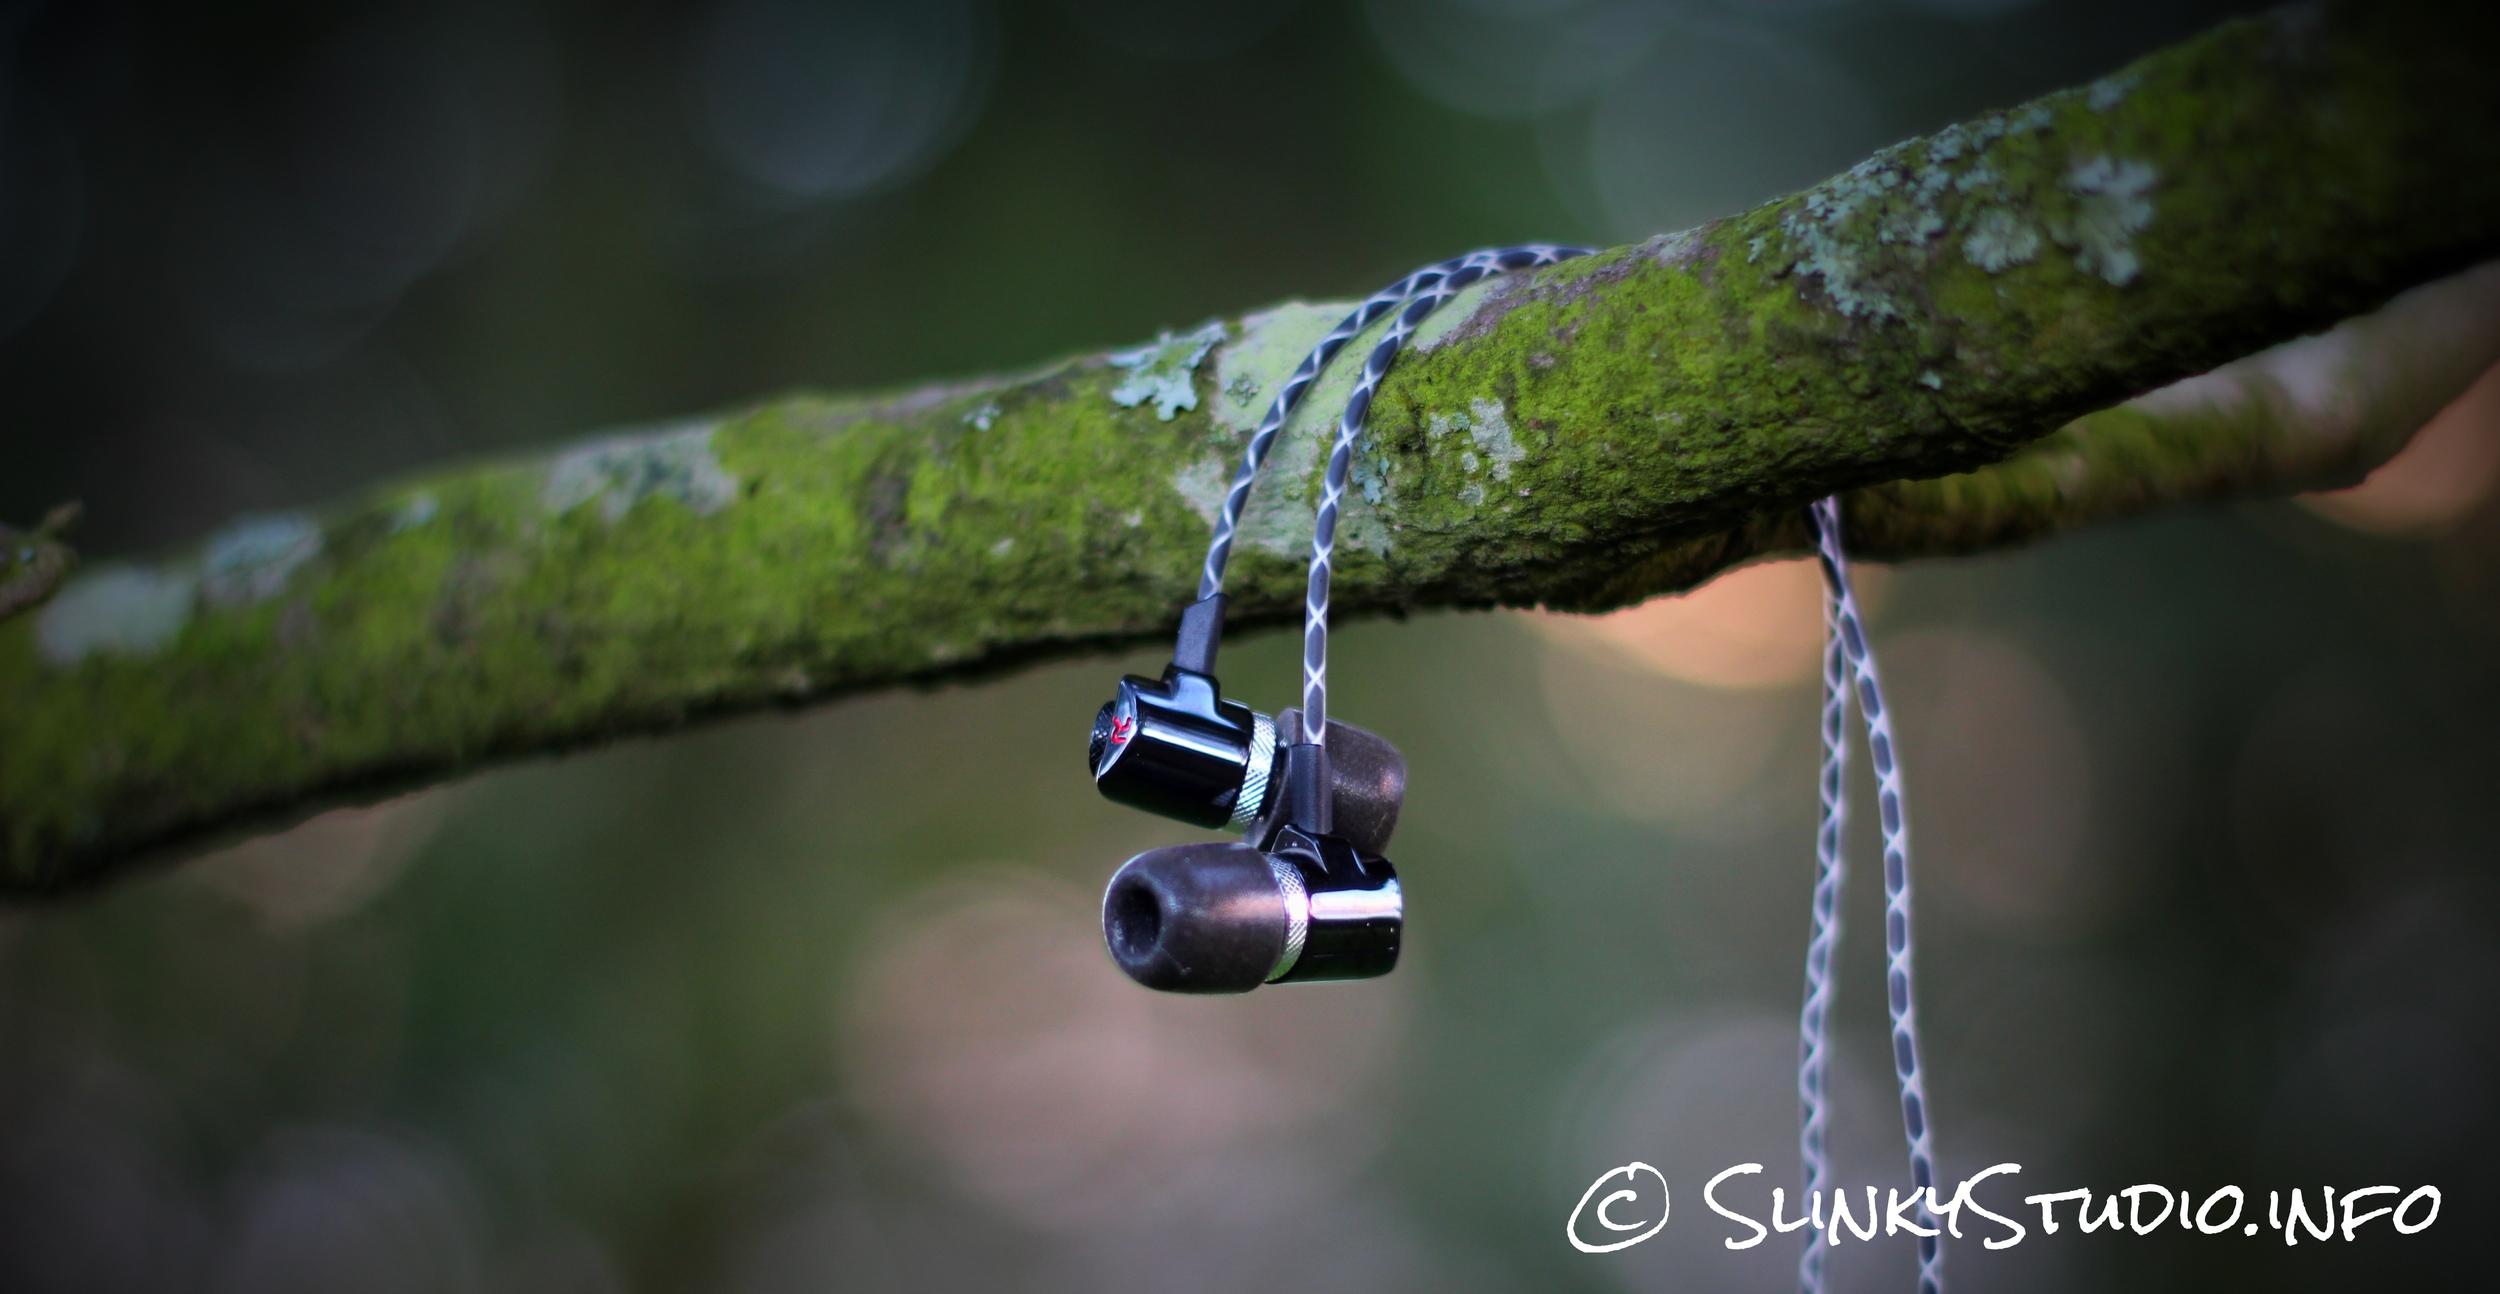 RBH EP3 Earphones Dangling From Tree